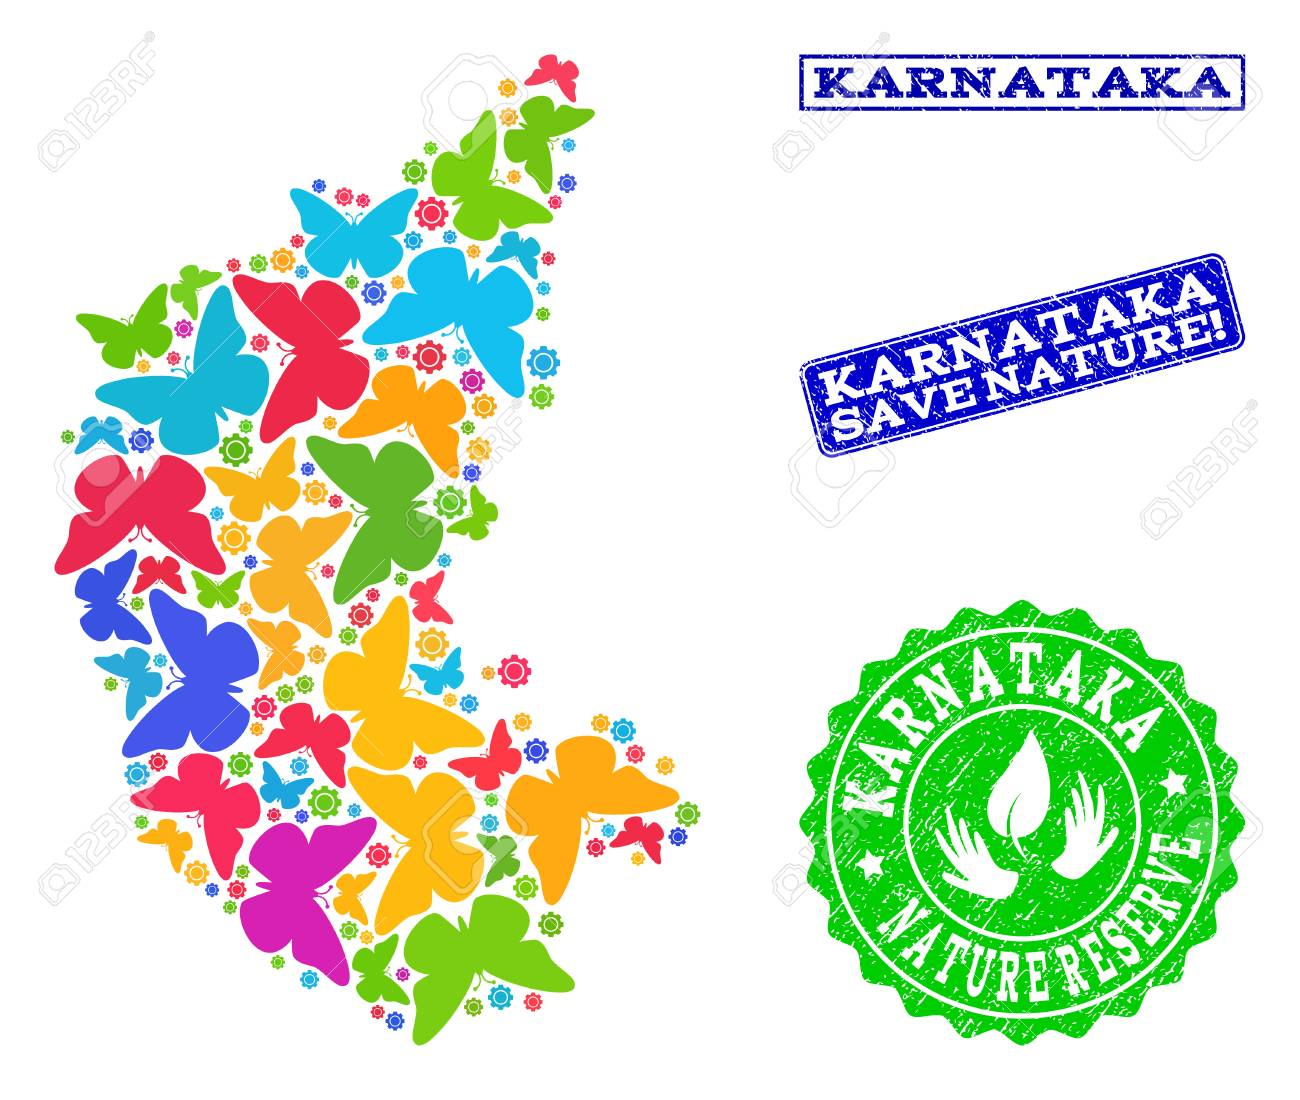 Ecological combination of bright mosaic map of Karnataka State.. on map of delhi, map of rajasthan, map of haryana, map of bangalore, map of kashmir, map of mysore, map of yunnan province, map of hubei province, map of gujarat, map of andhra pradesh, map of orissa, map of nunatsiavut, map of mumbai, map of uttar pradesh, map of maharashtra, map of arunachal pradesh, map of india, map of west bengal, map of kerala, map of madhya pradesh,